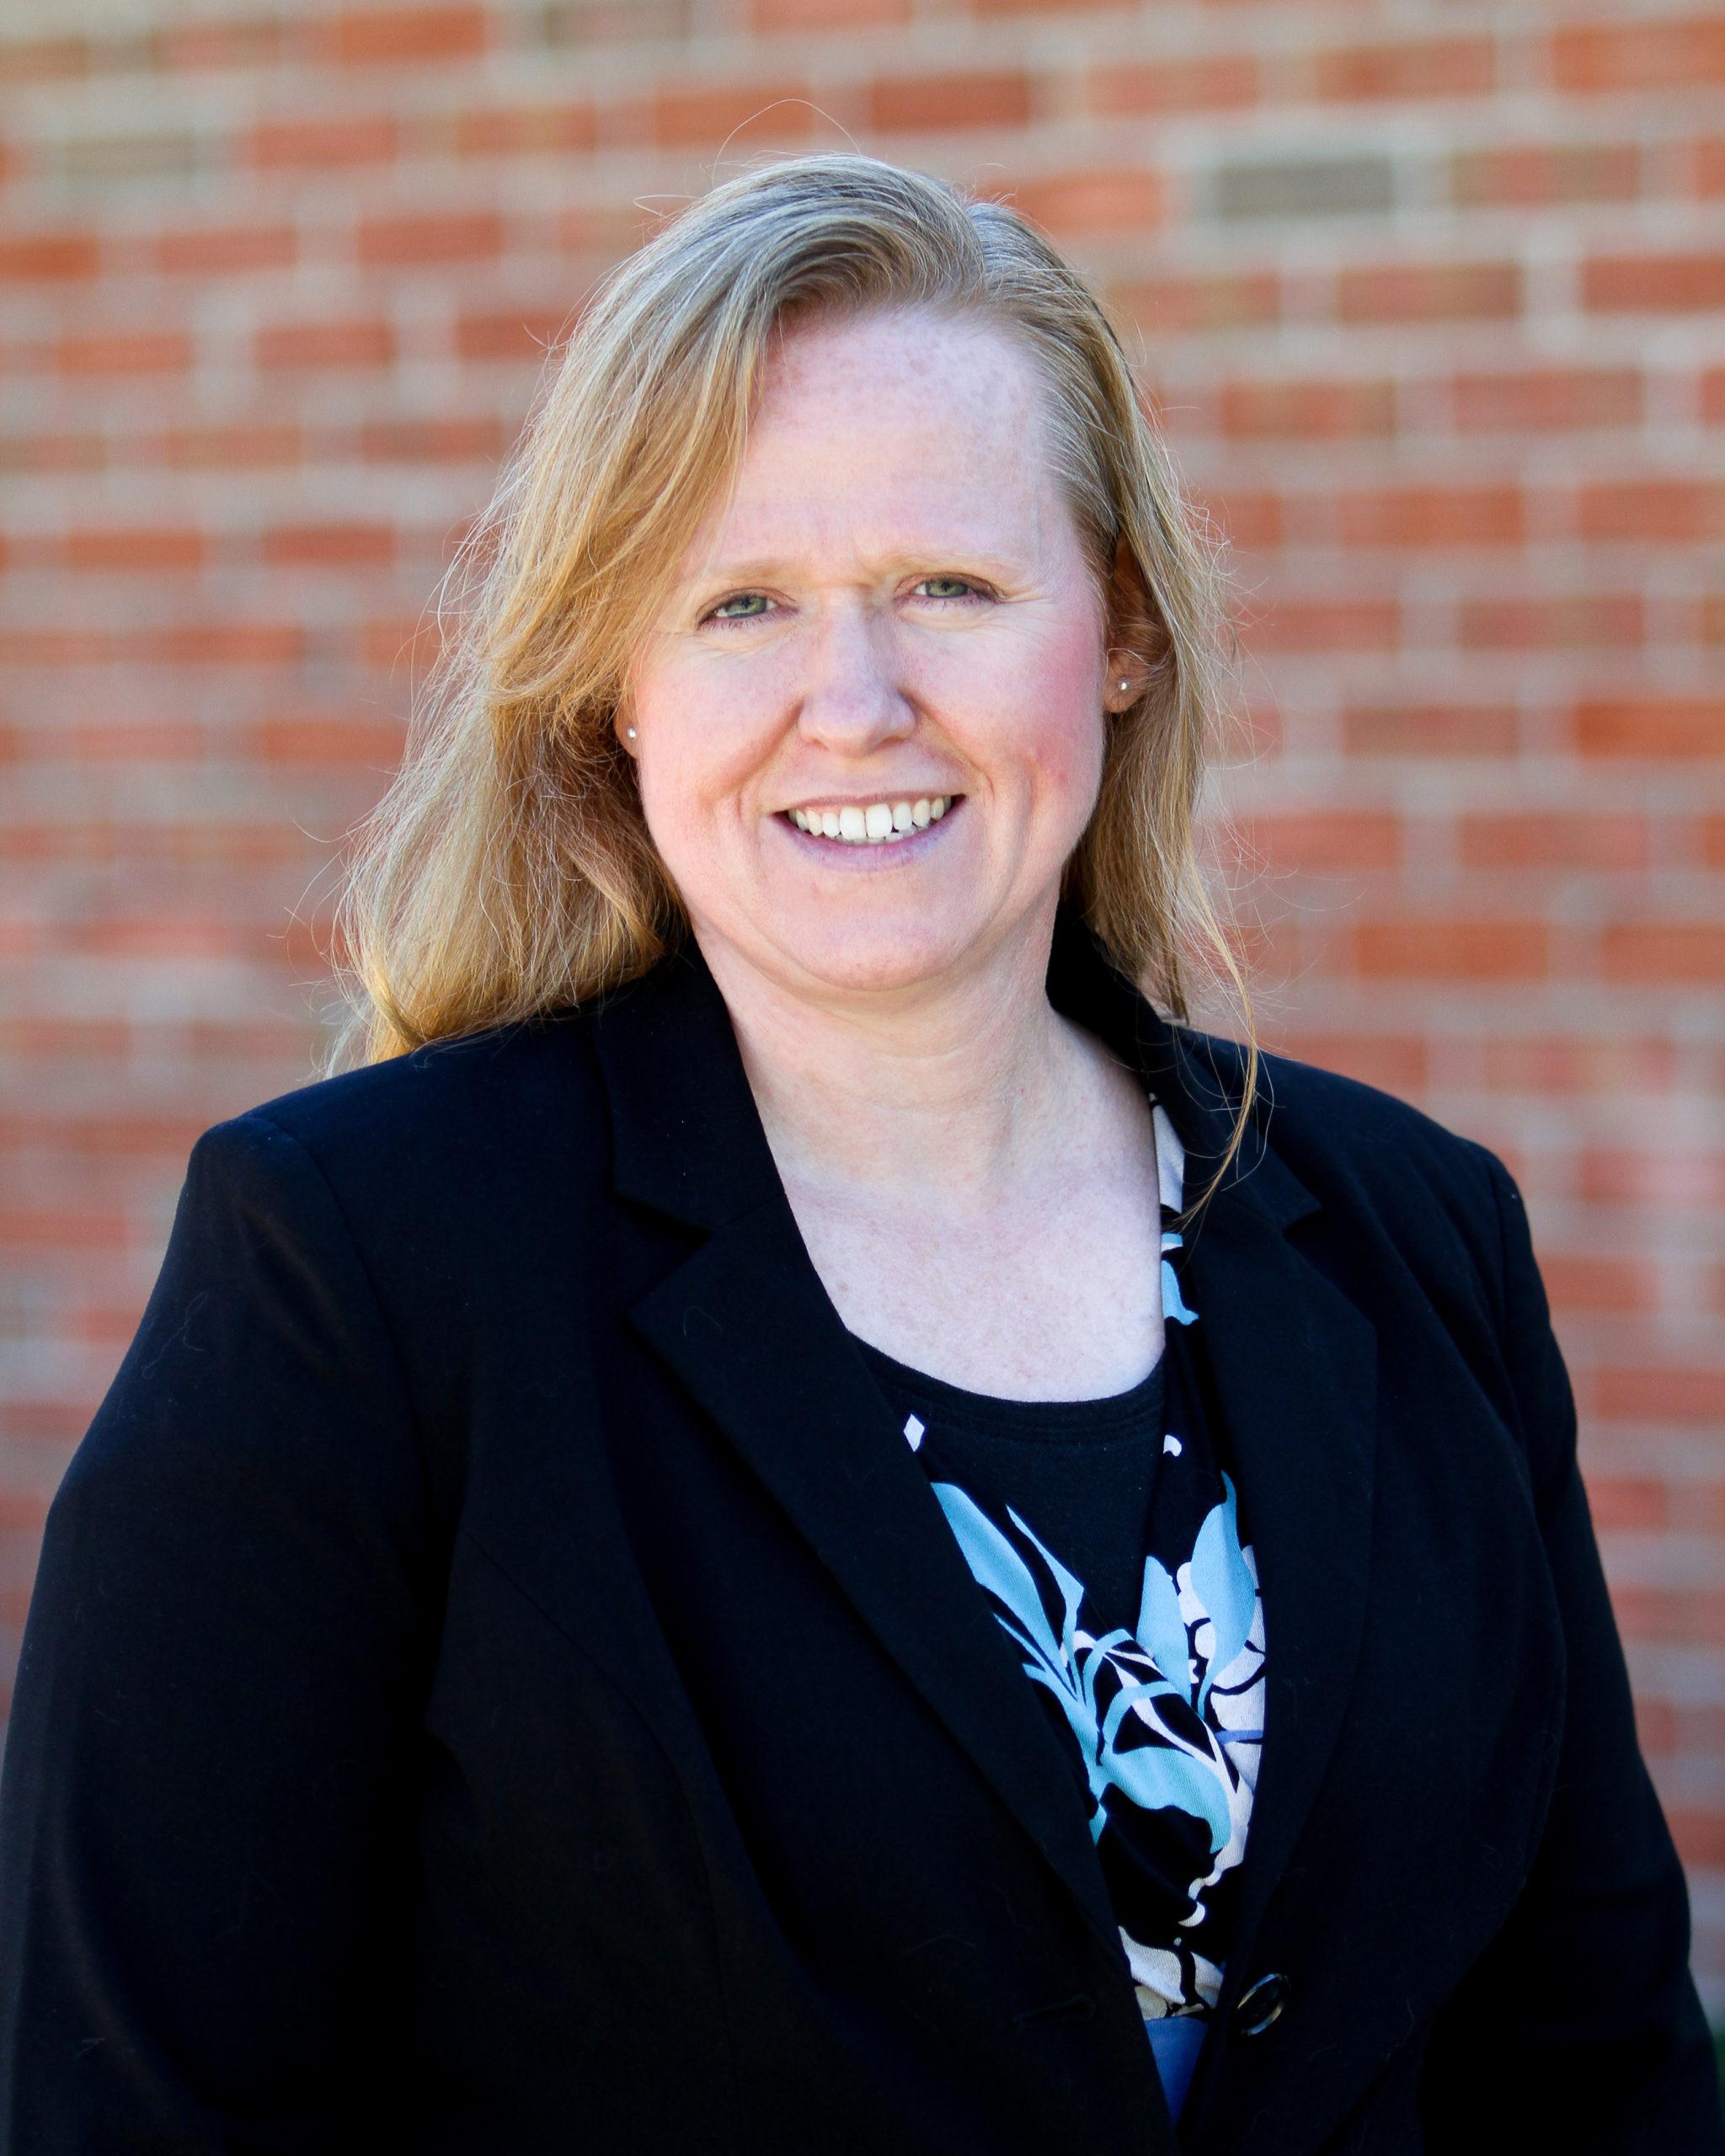 Attorney Melissa Pearce